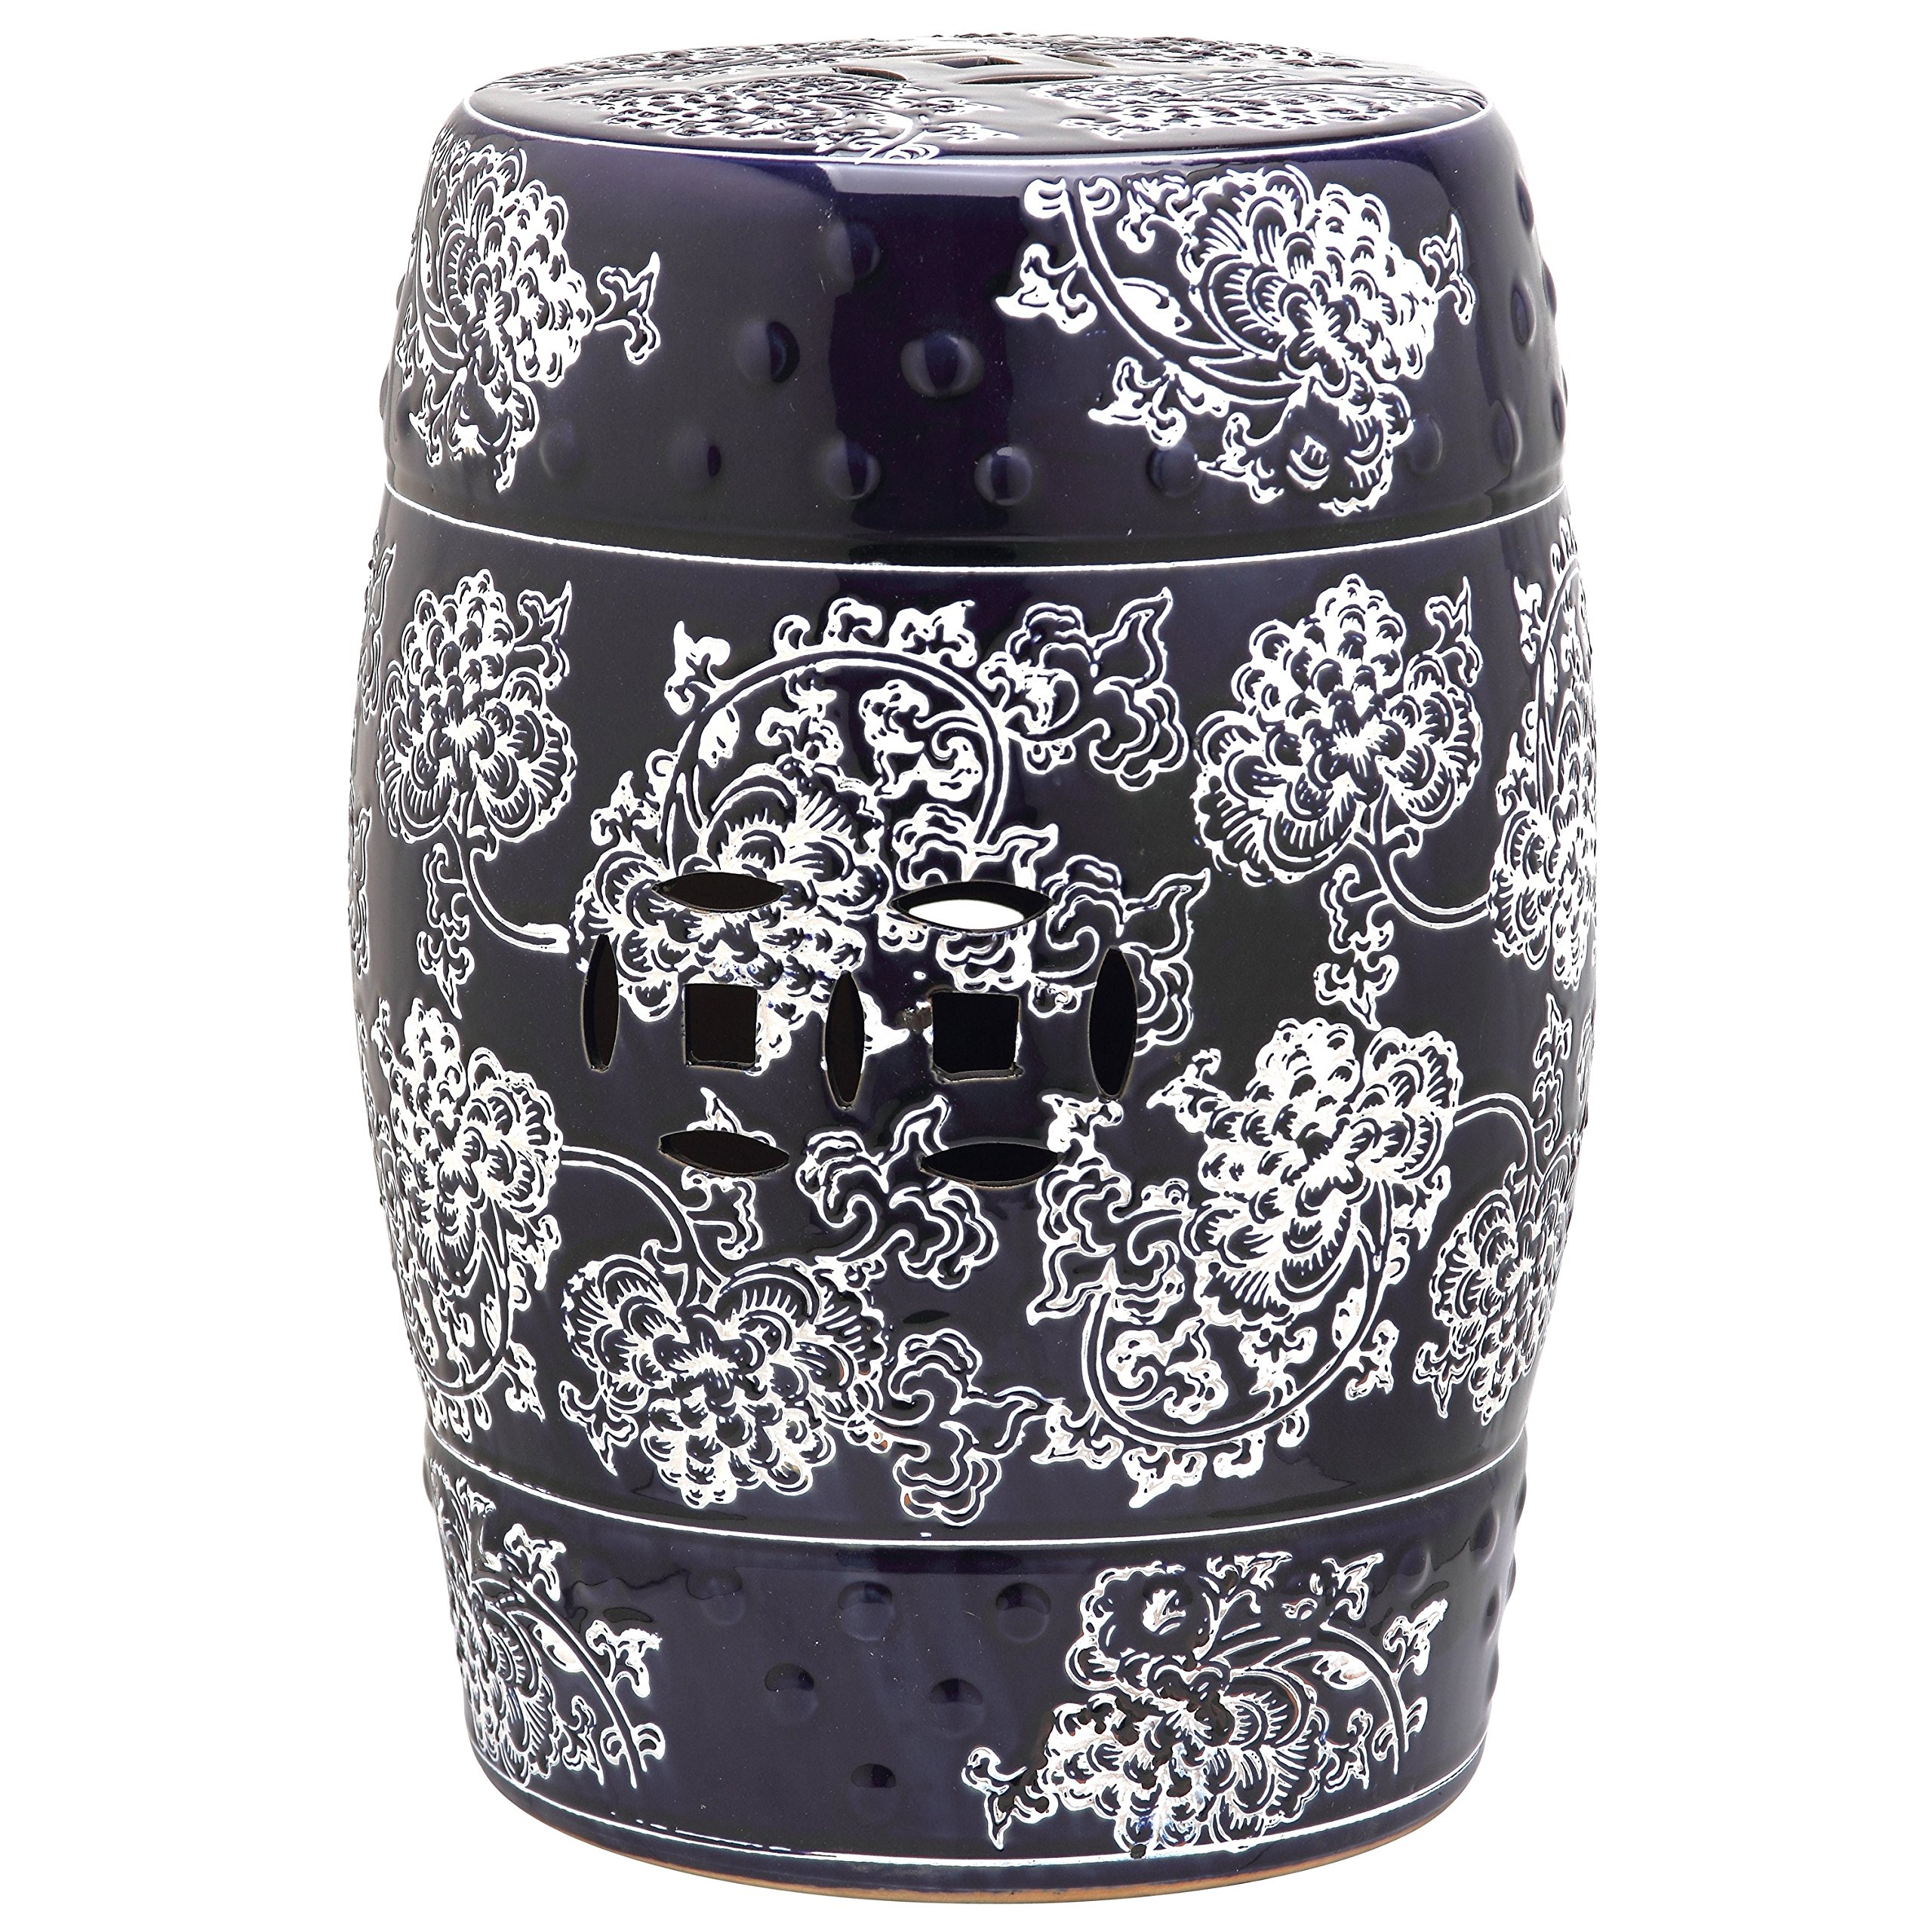 Safavieh Castle Gardens Collection Midnight Flower Navy And White Glazed Ceramic Garden Stool